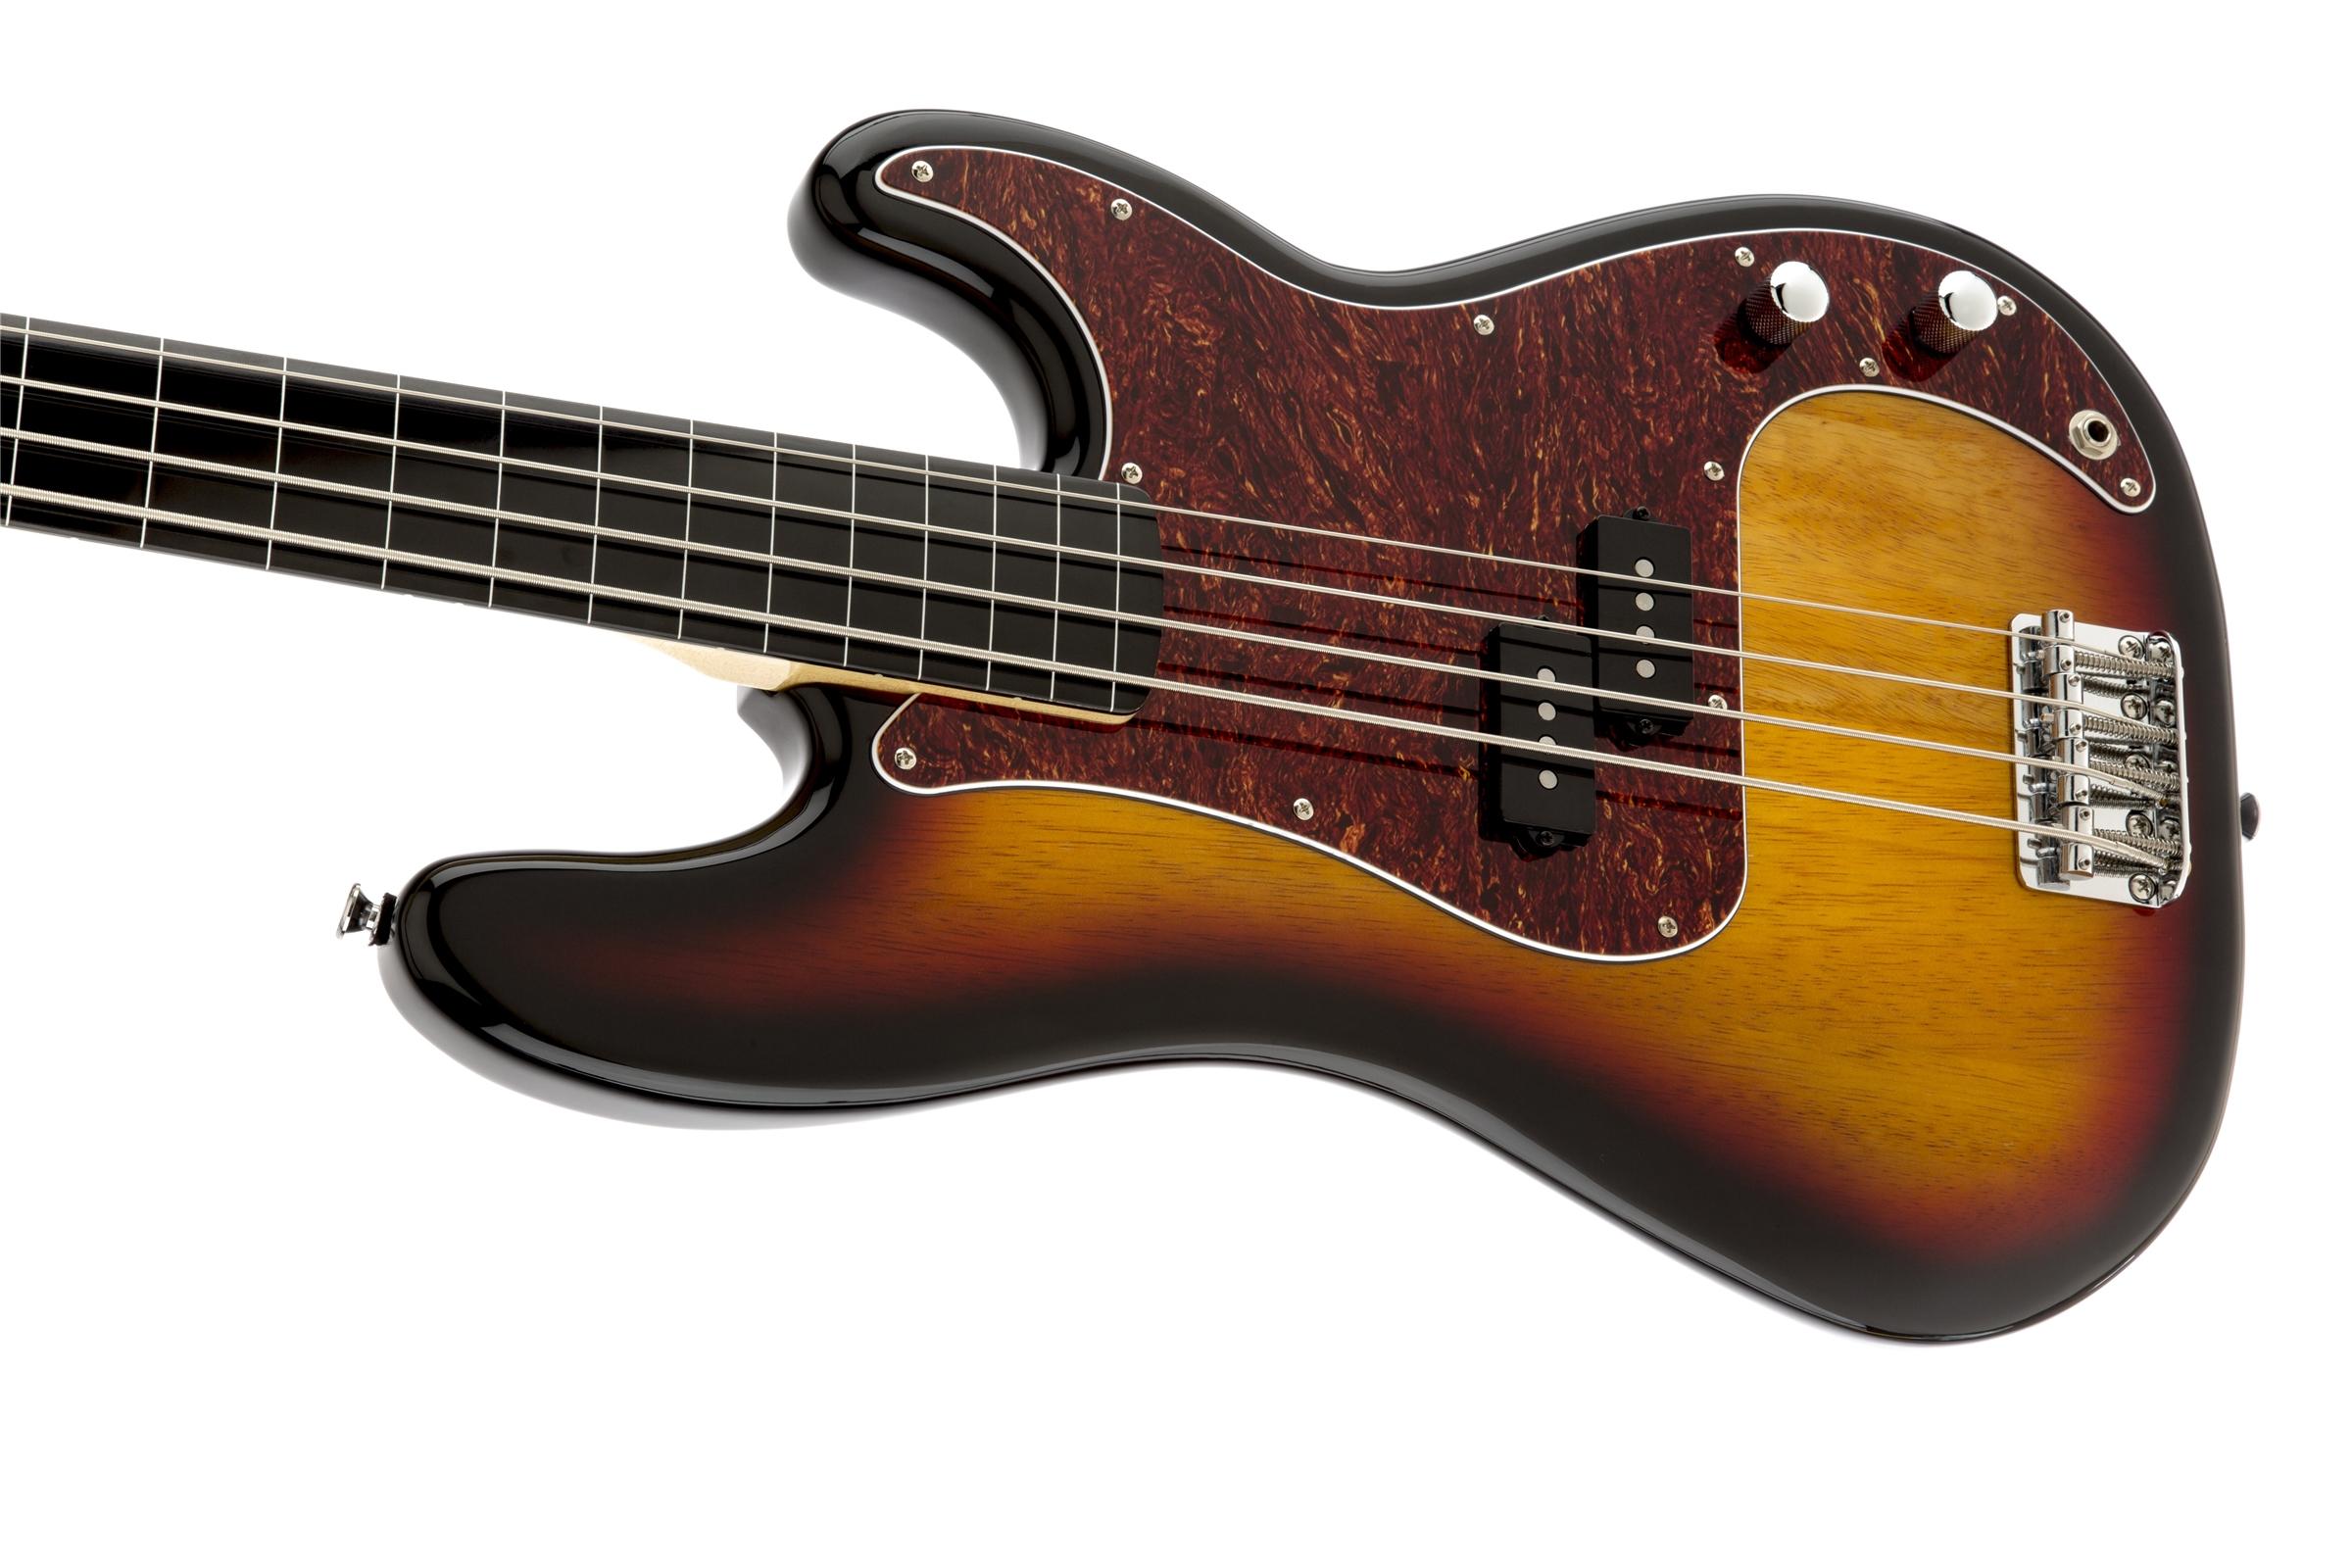 squier vintage modified precision bass fretless squier bass guitars. Black Bedroom Furniture Sets. Home Design Ideas